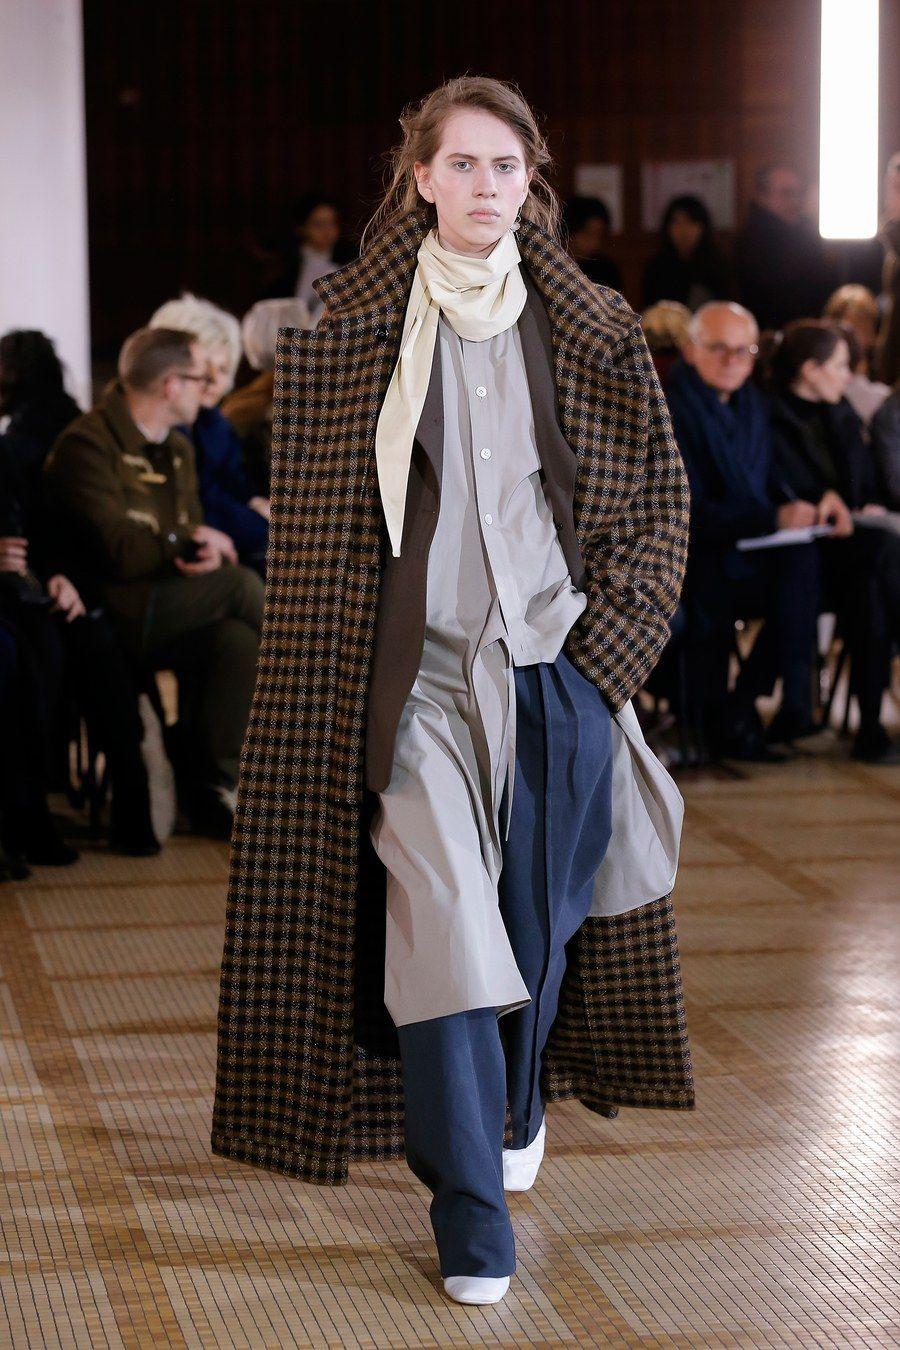 Beauty5 for ideas, Sweater long vest how to wear